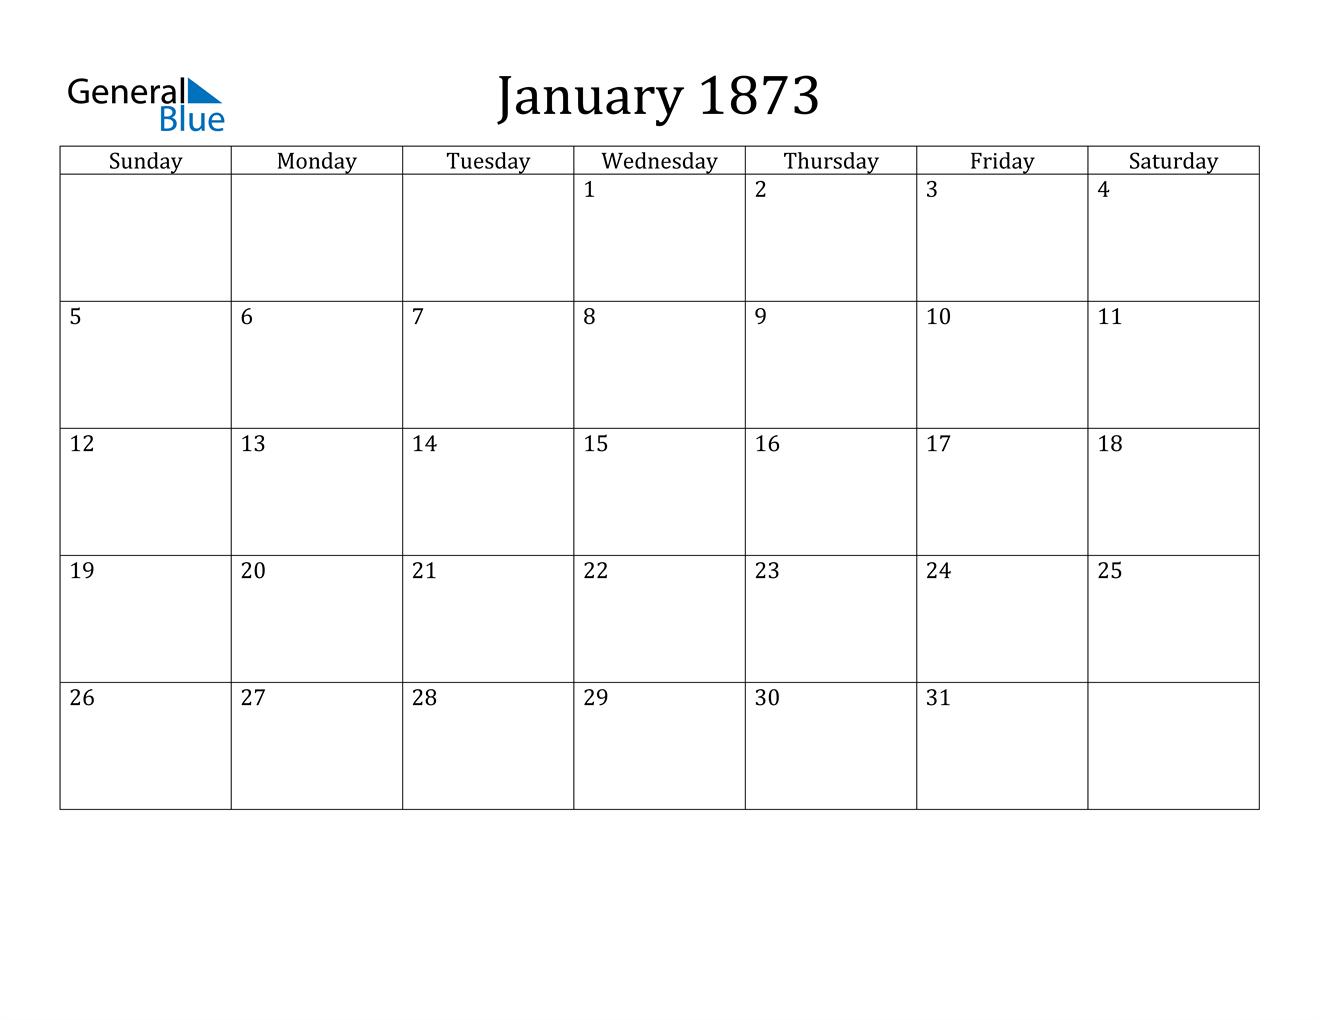 Image of January 1873 Calendar